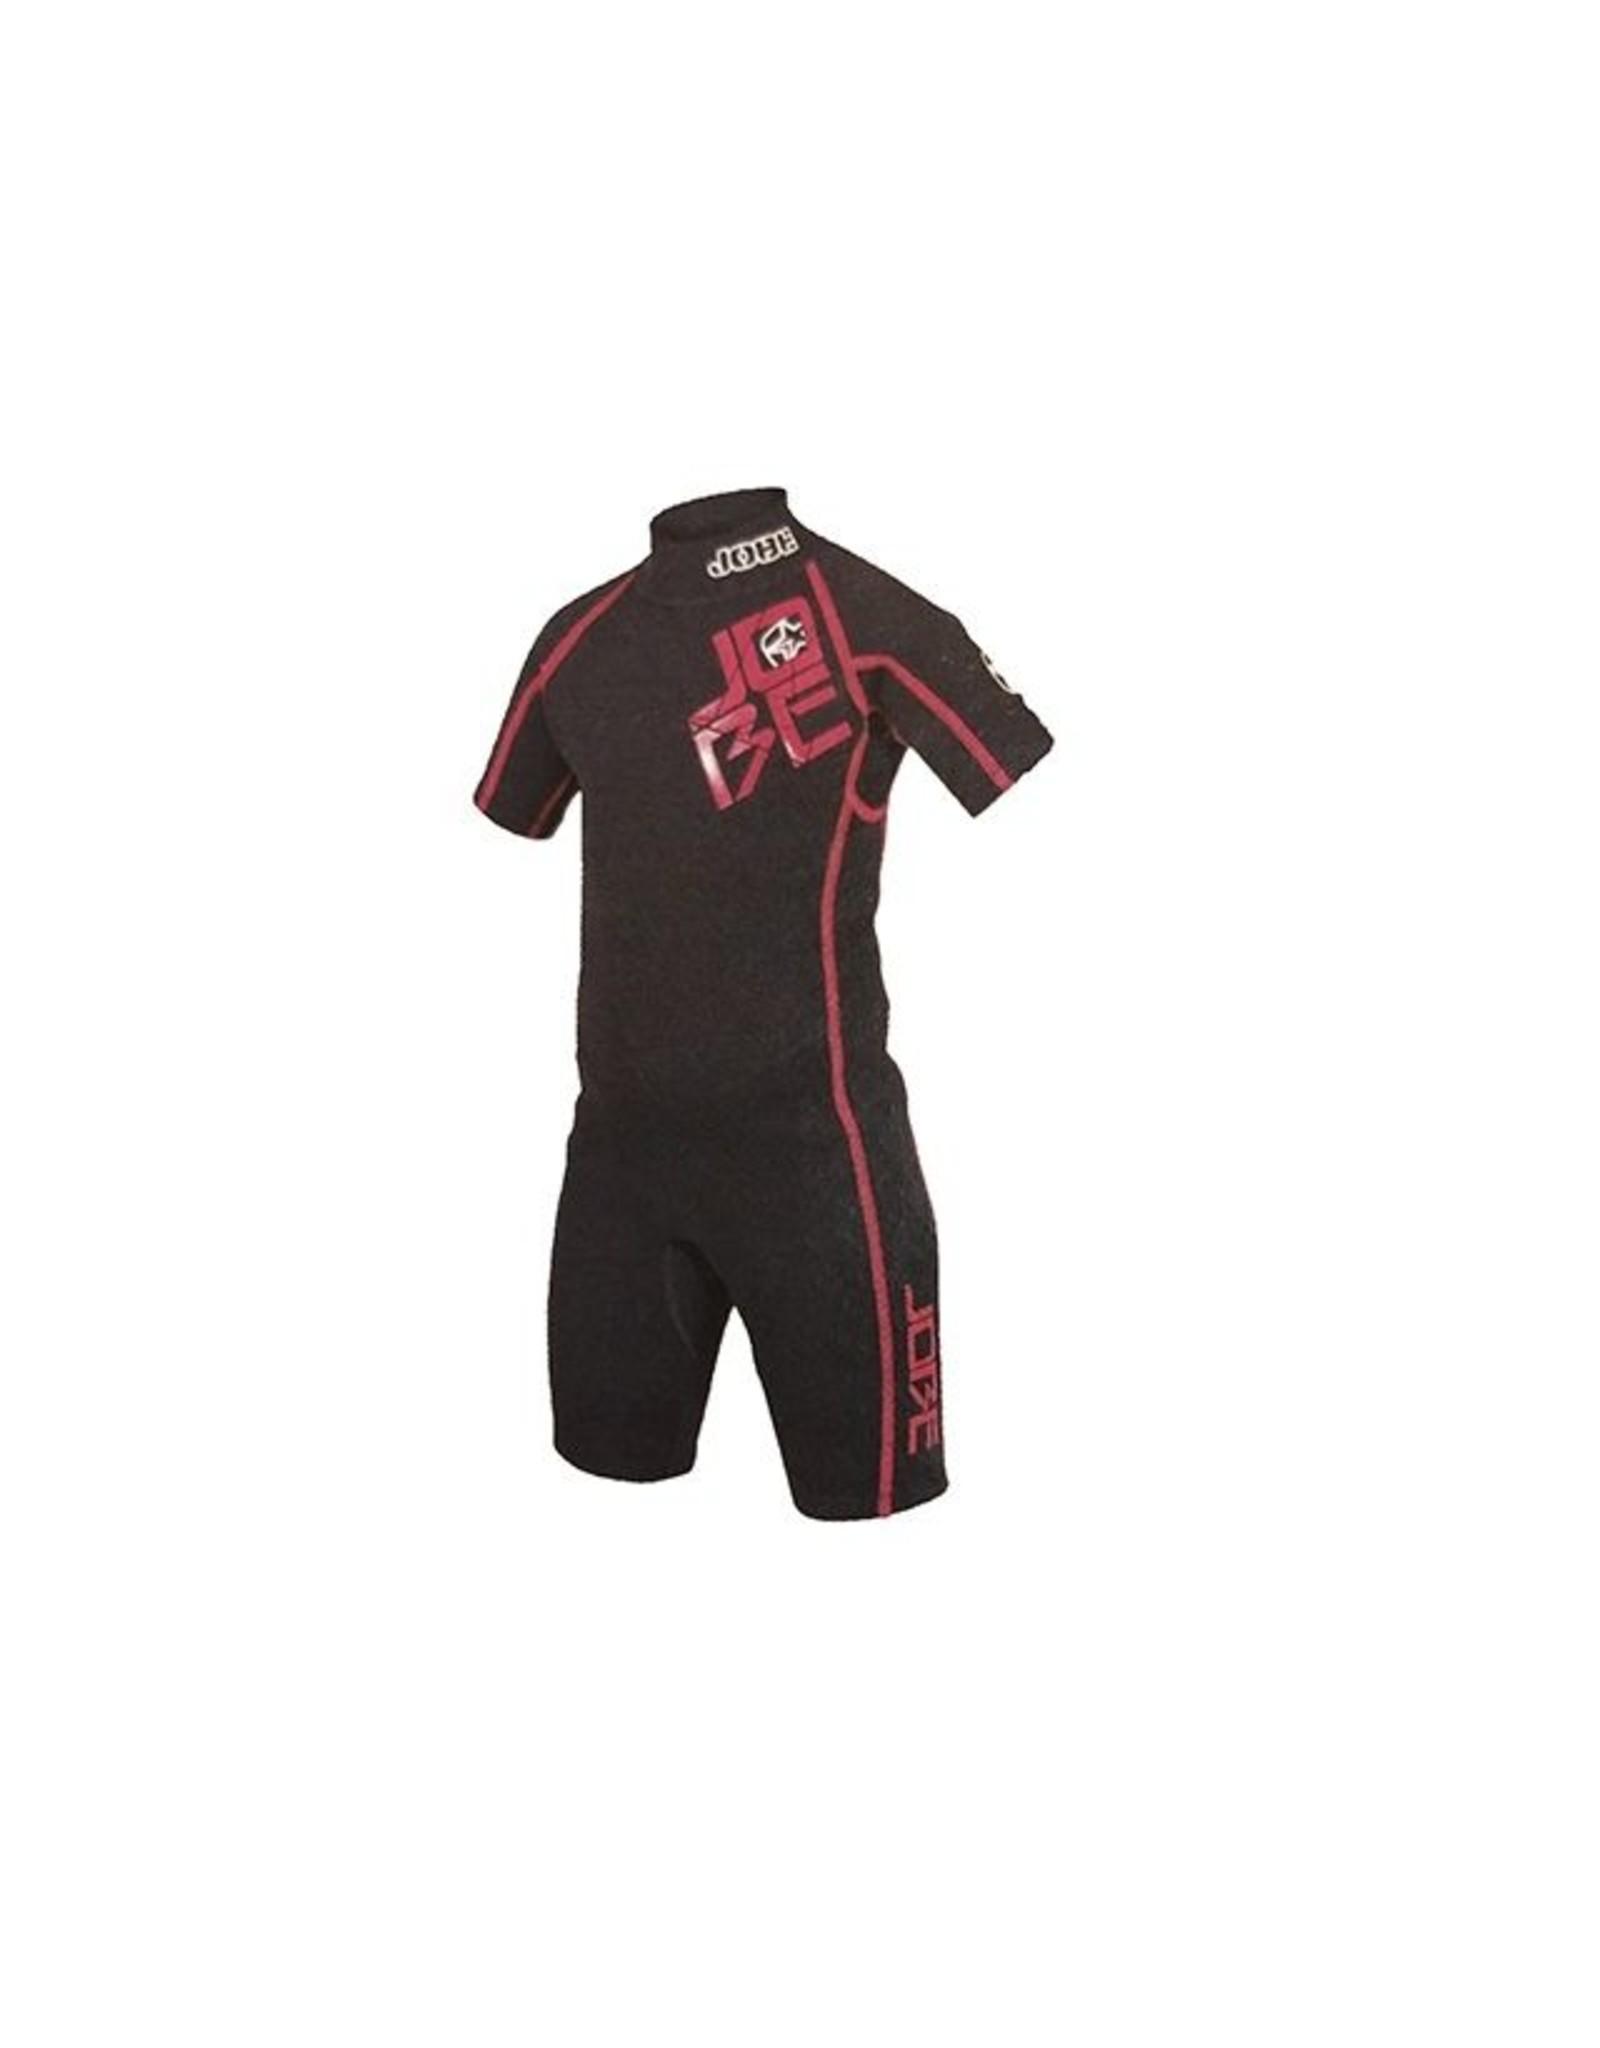 Hebor Watersport Jobe Shorty Trace kinder wetsuit roze